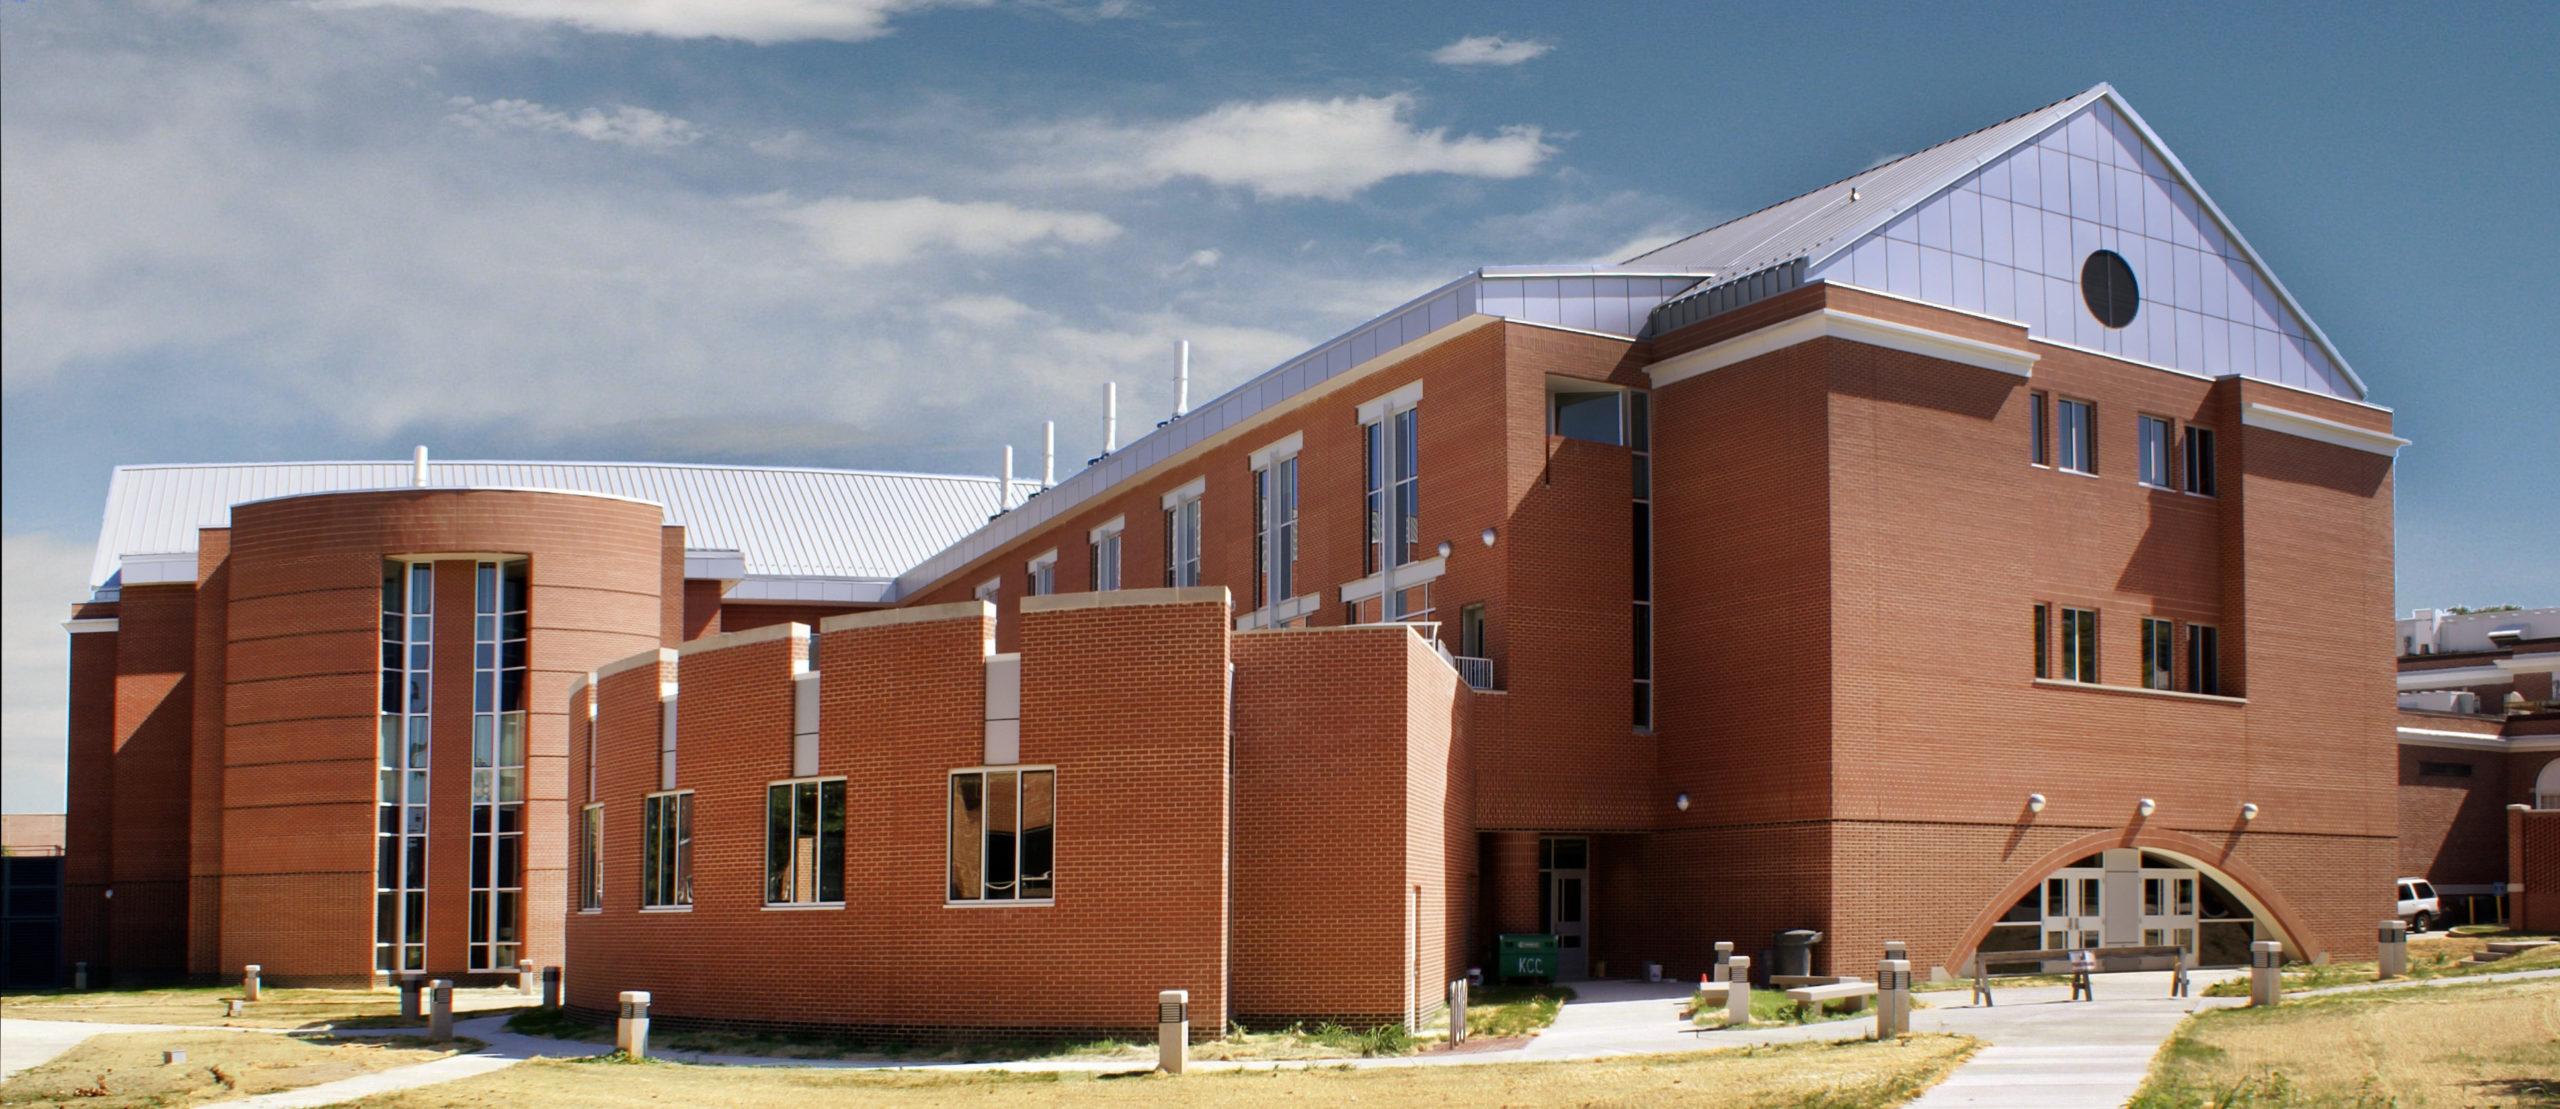 VSU  College of Engineering and Technology